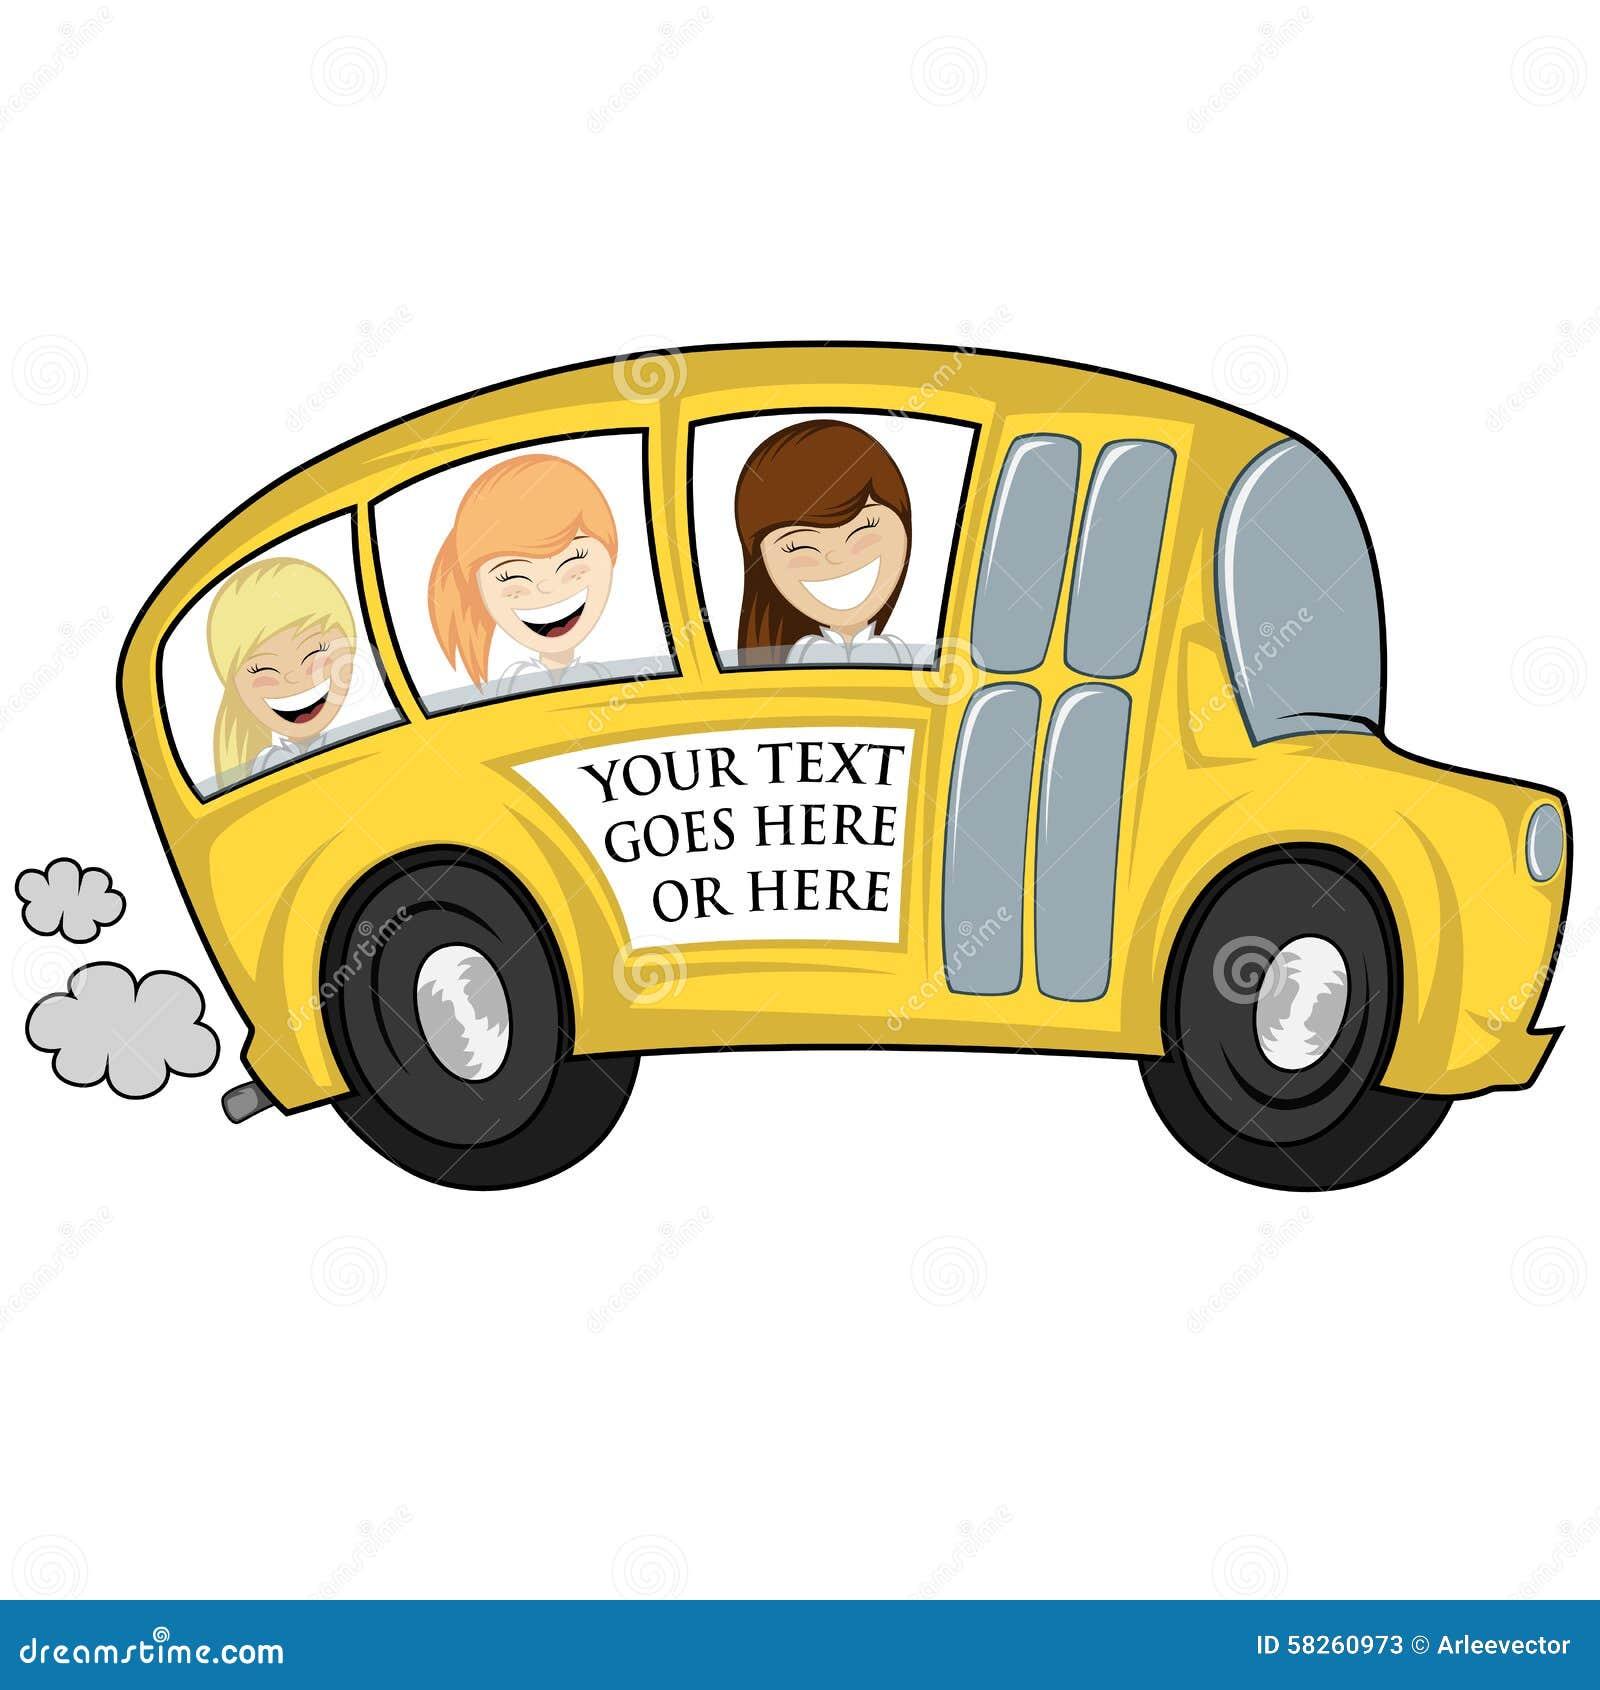 Cartoon School Bus Looking Out Window